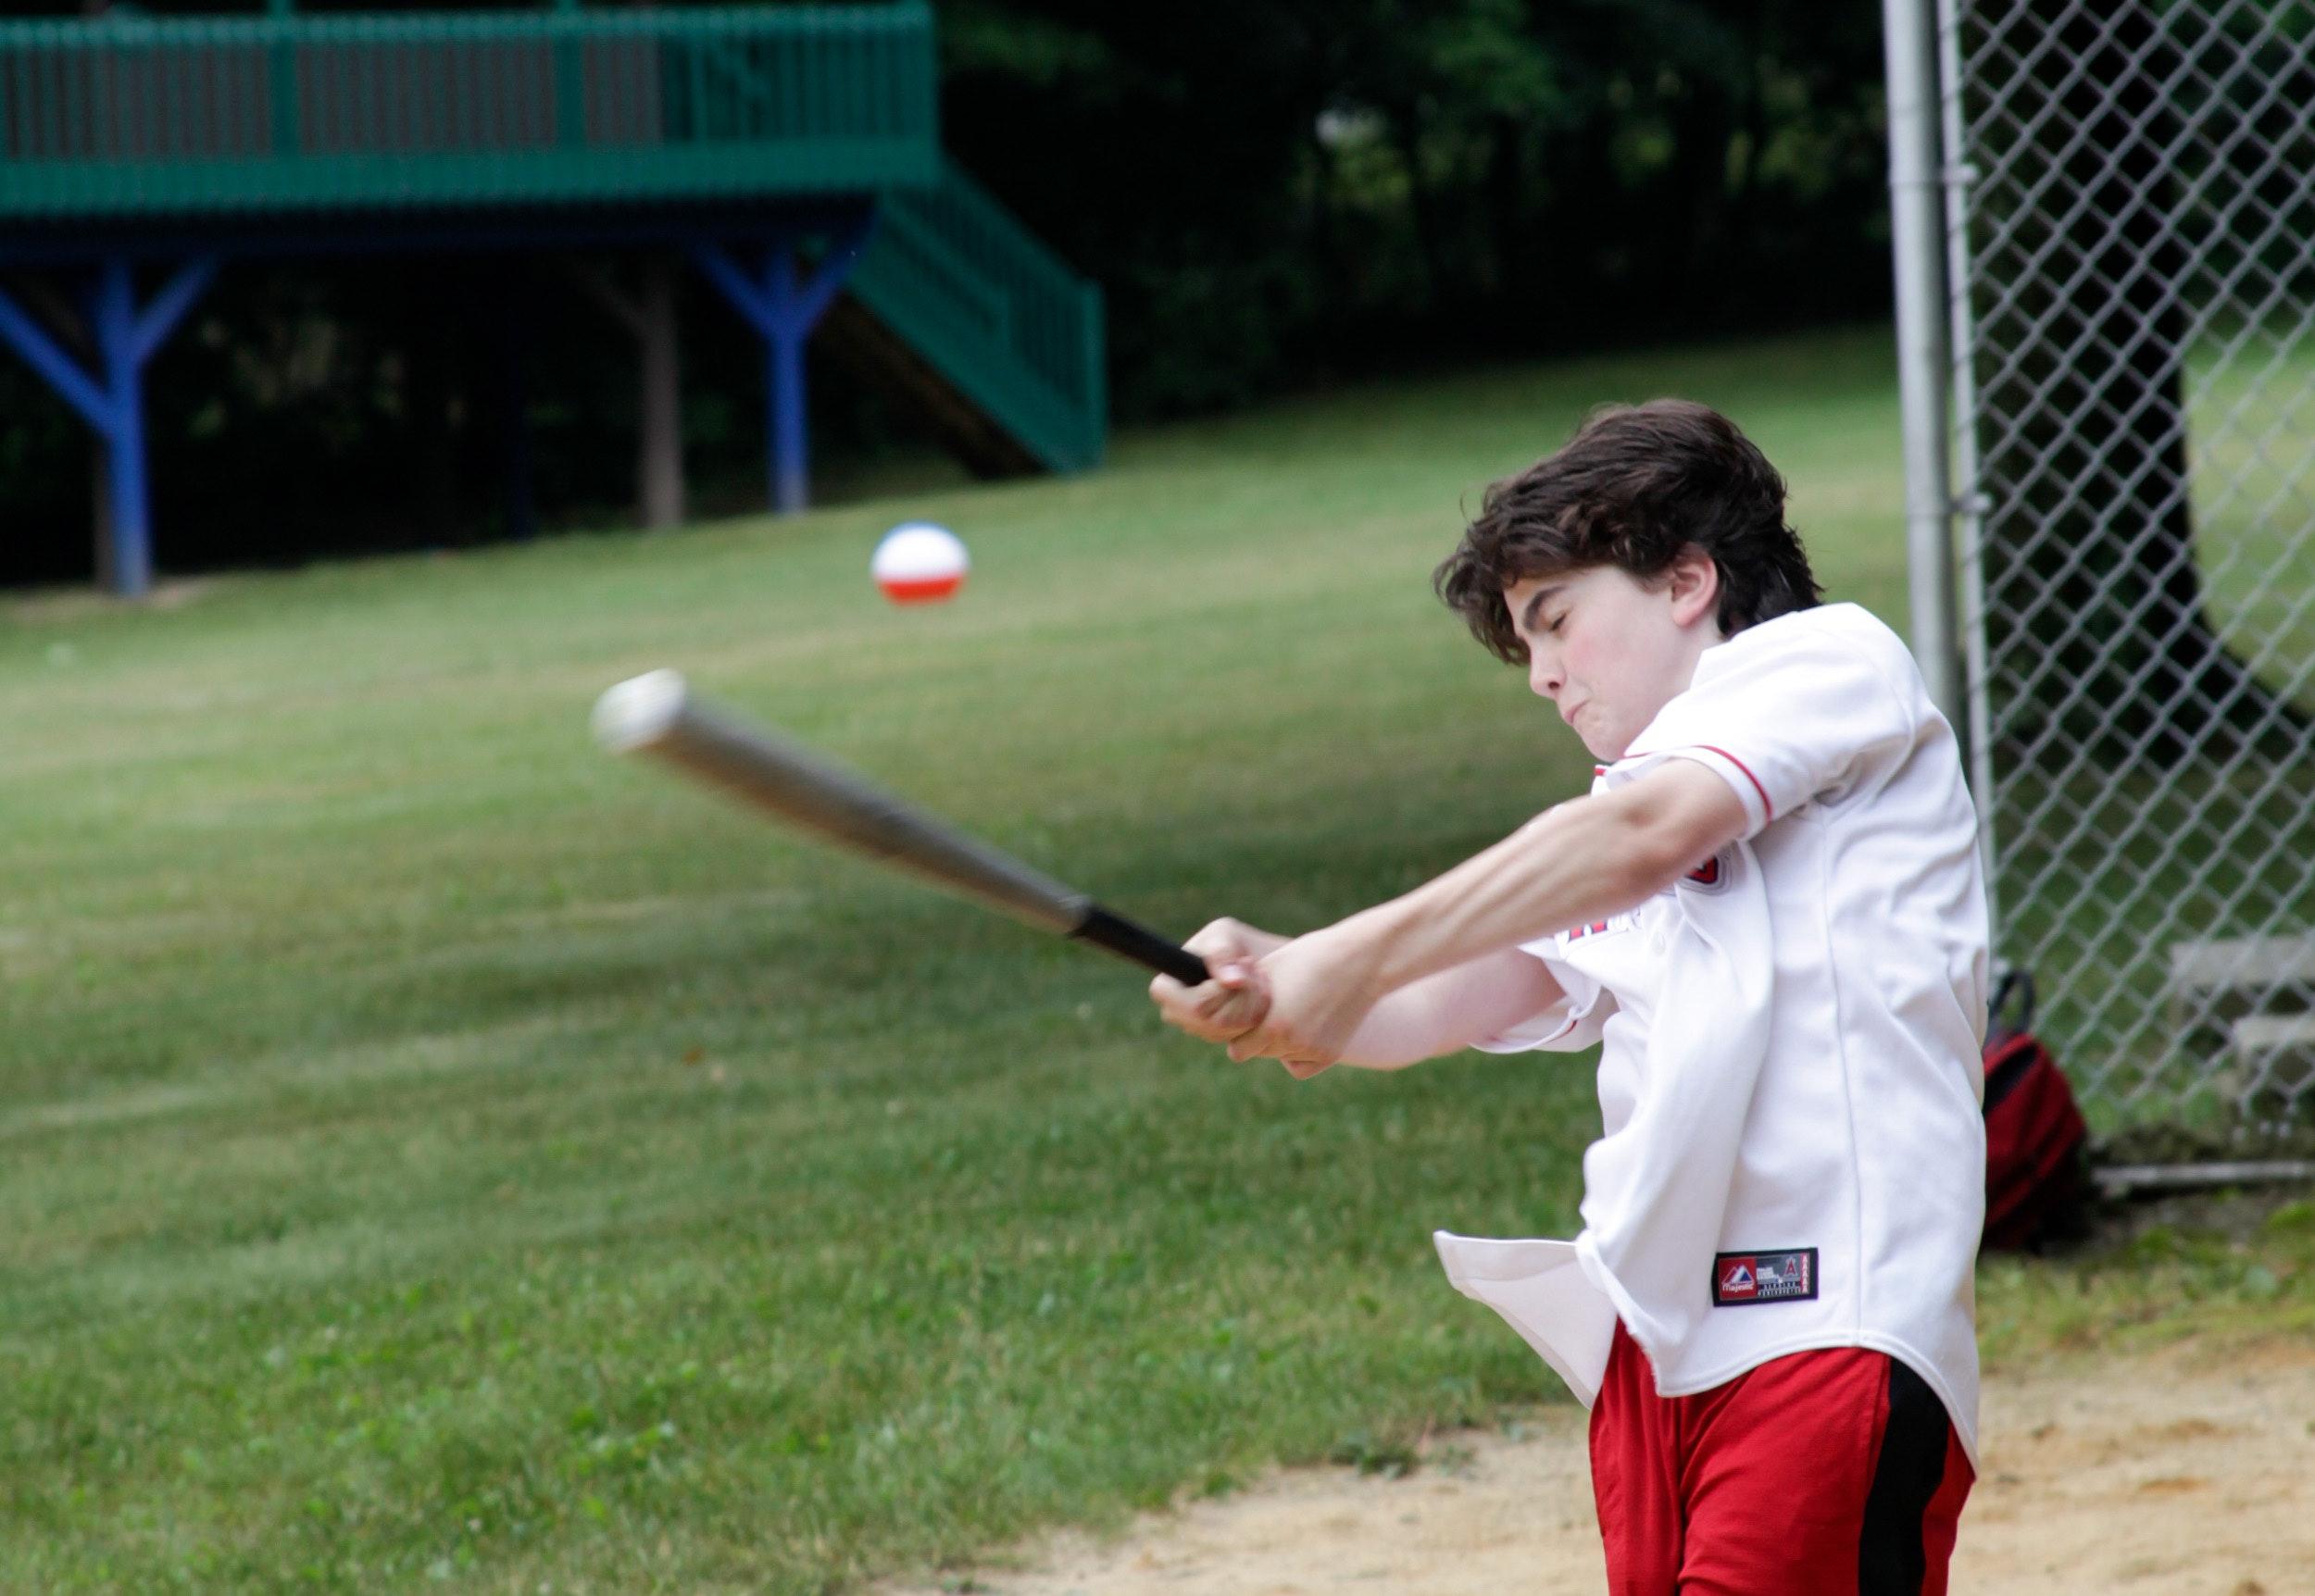 Deerkill day camp activities atletics.jpg?ixlib=rails 2.1